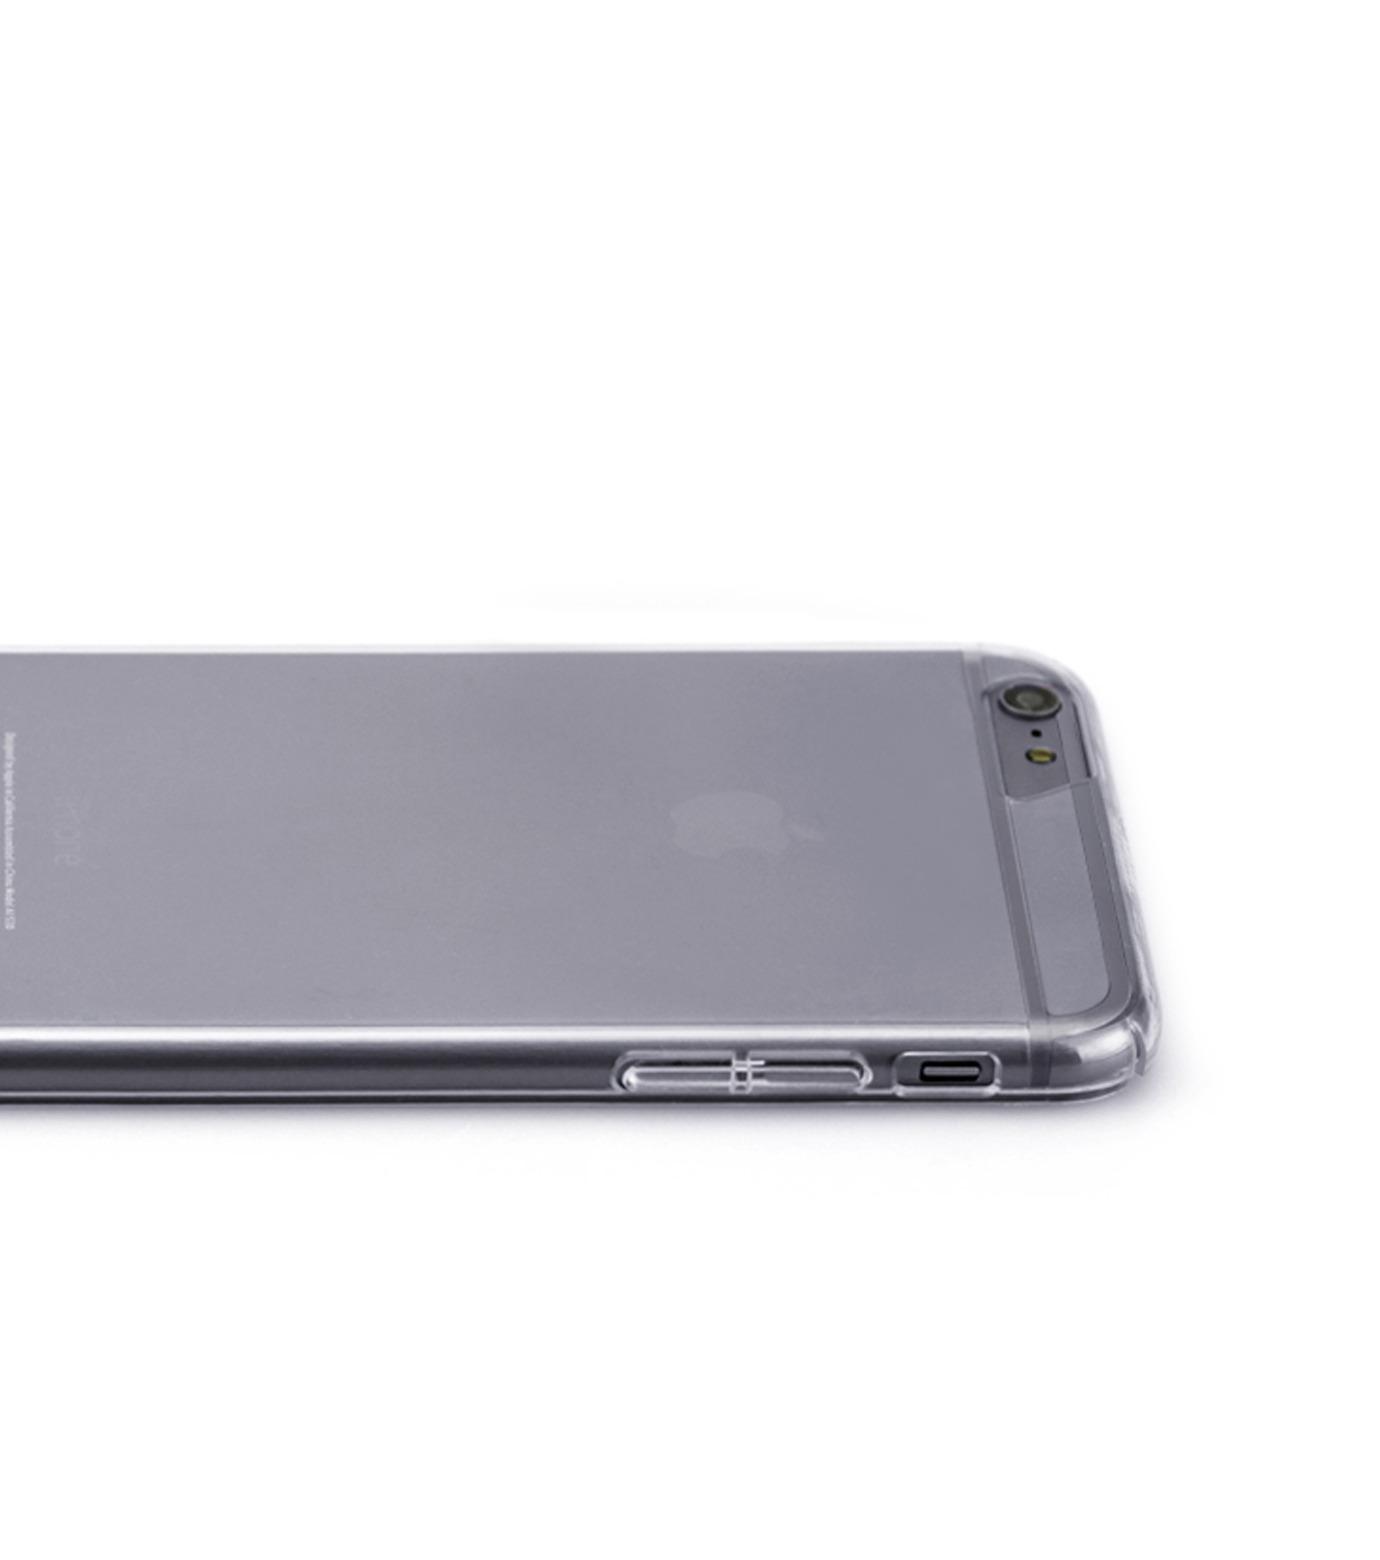 Tunewear(チューンウエア)のEGGSHELL for iPhone6 Plus-WHITE(ケースiphone6plus/6splus/case iphone6plus/6splus)-TUN-PH-0327-4 拡大詳細画像2